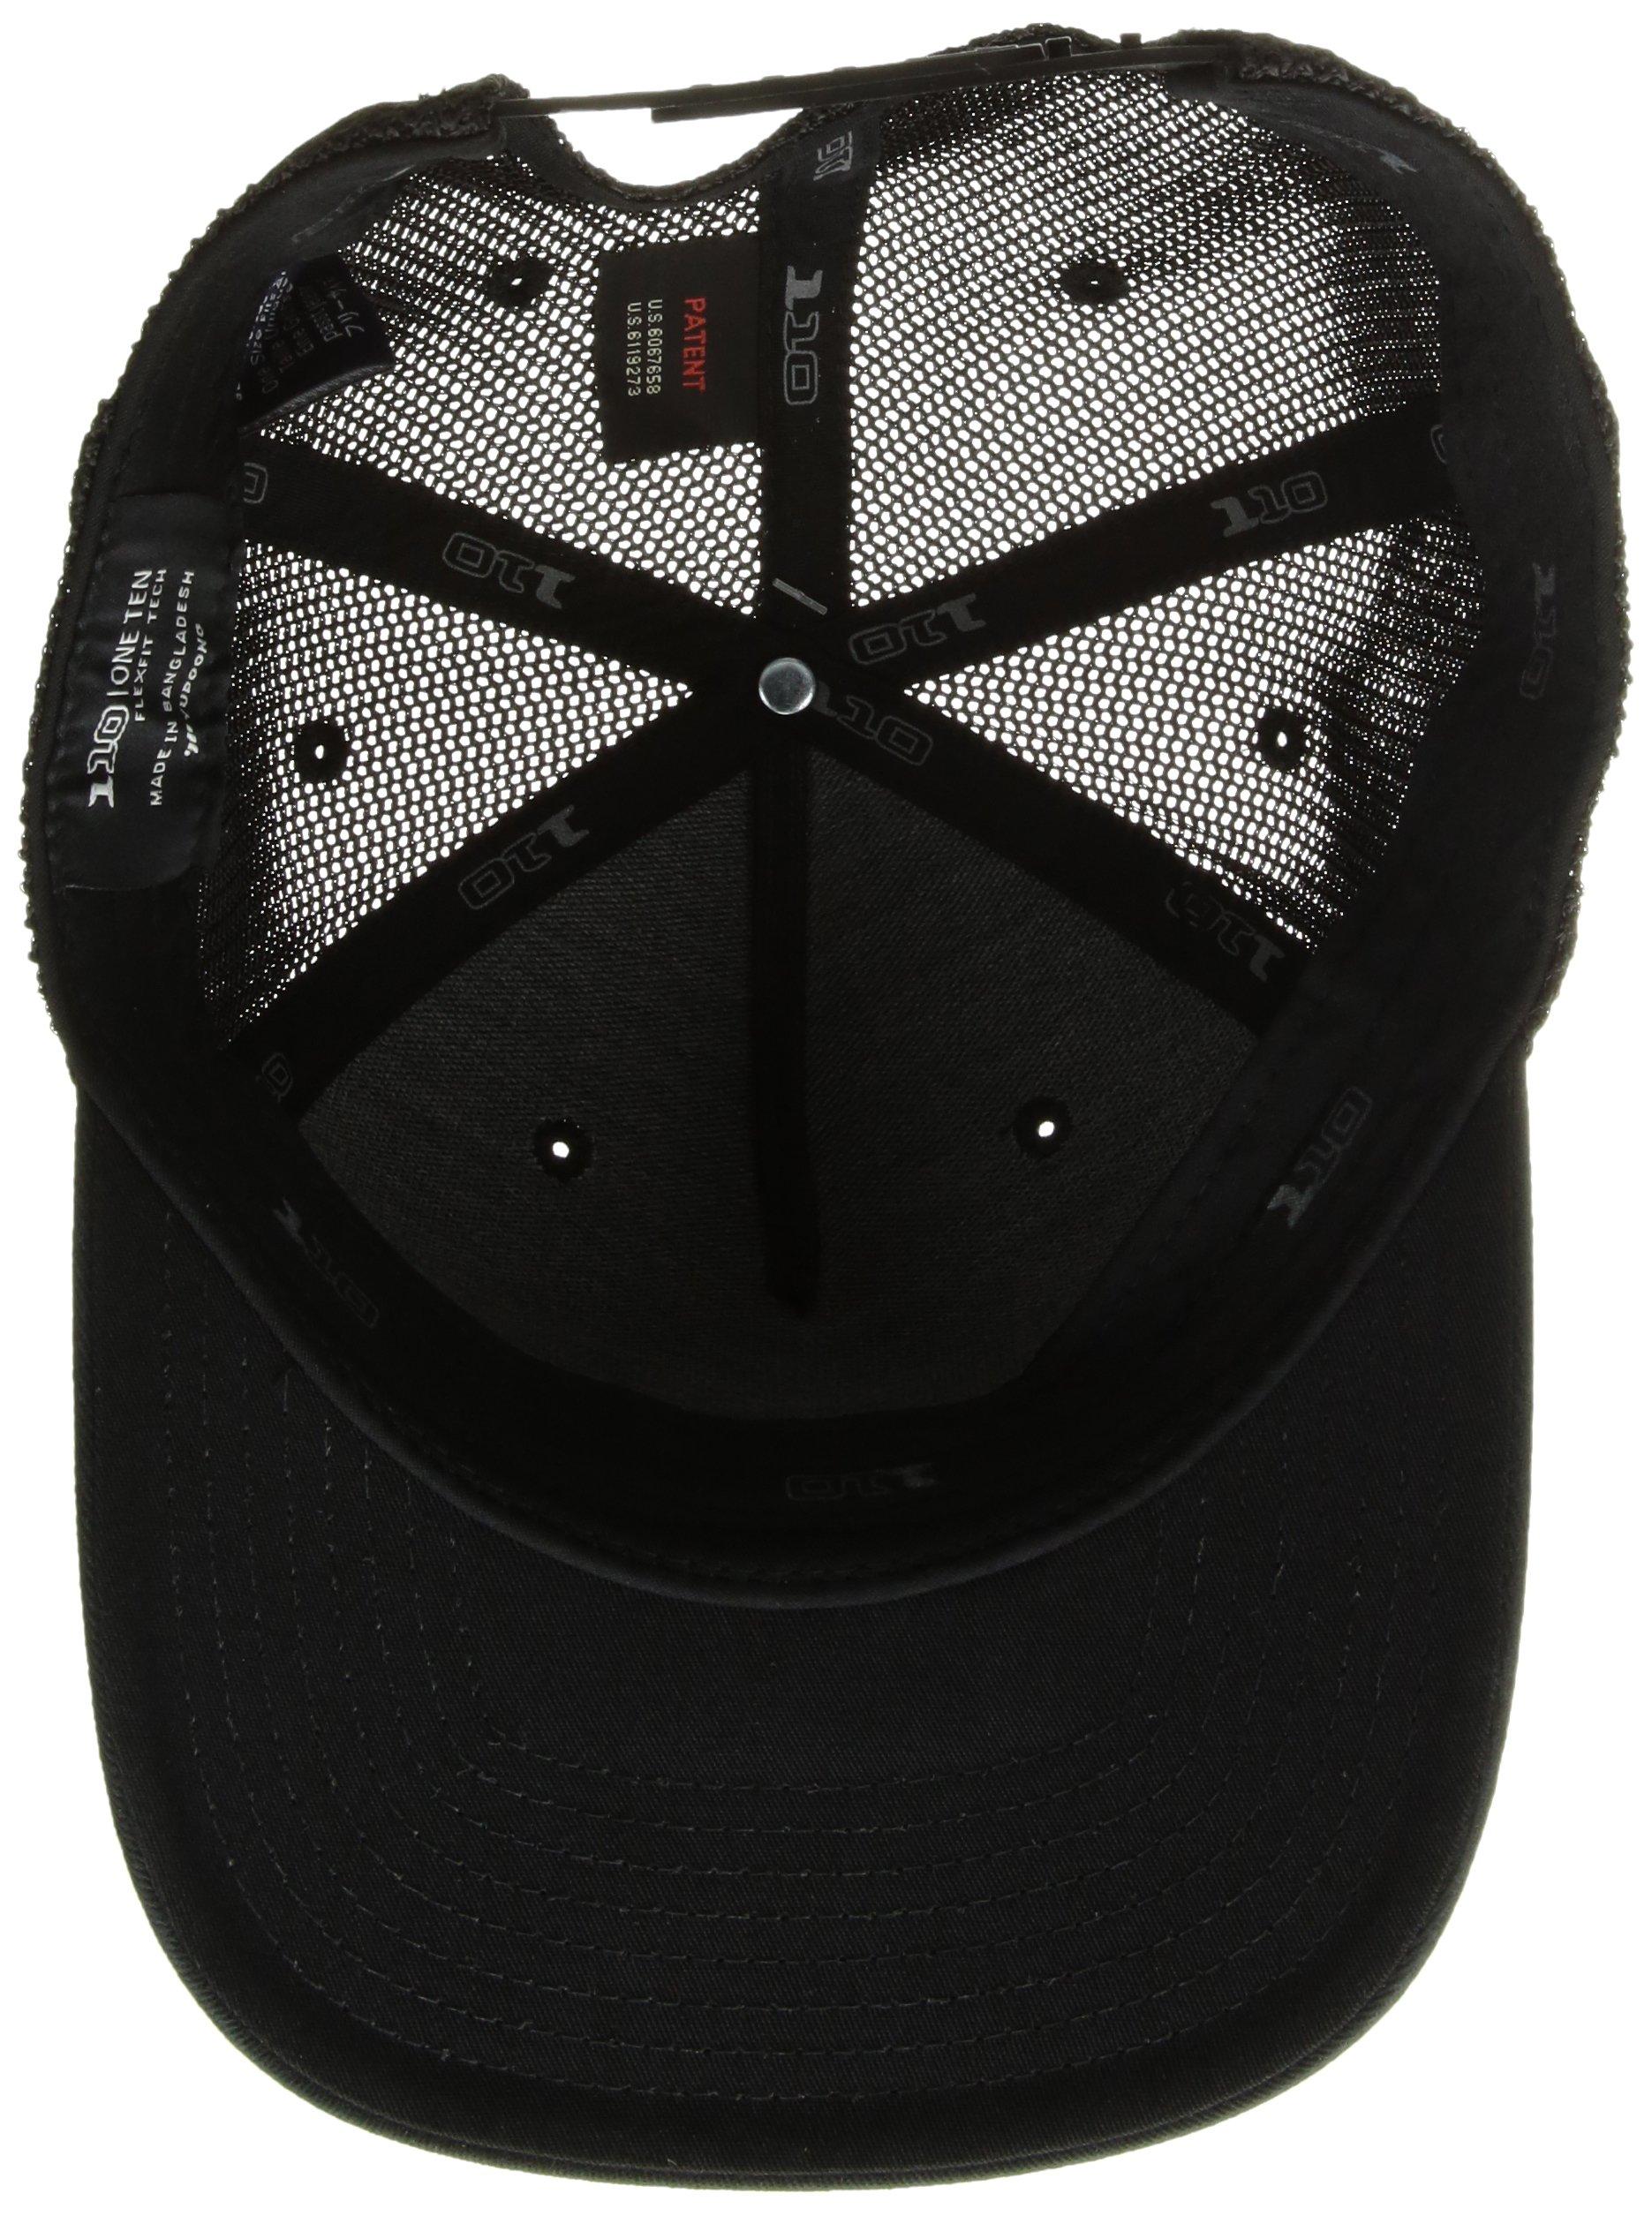 Arc teryx Unisex Logo Trucker Hat Black One Size - 18572   Baseball Caps    Clothing a680ce22c0b8